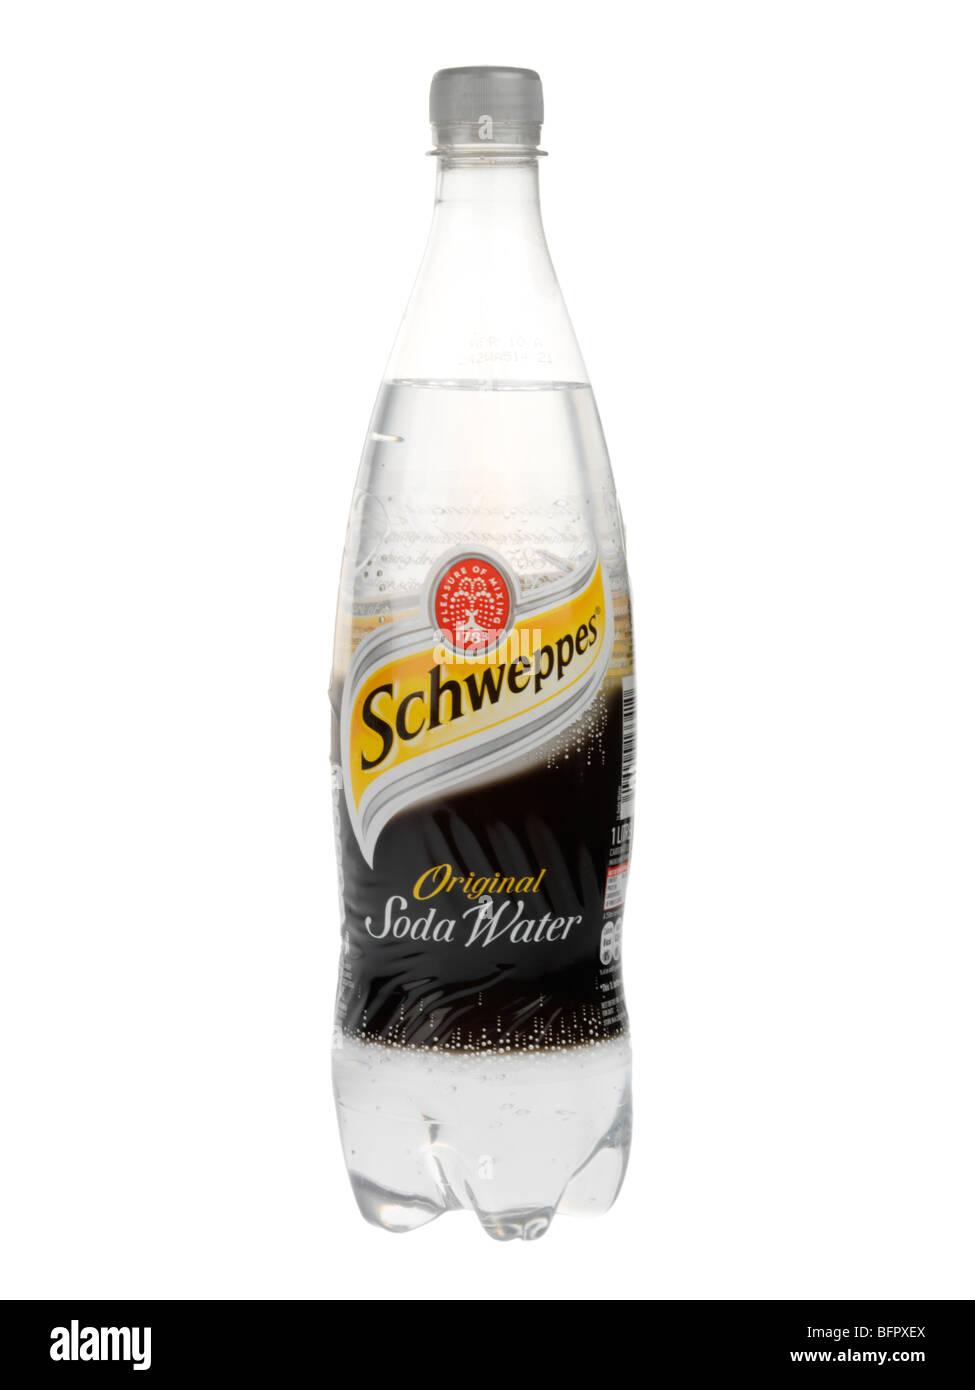 Soda Water - Stock Image